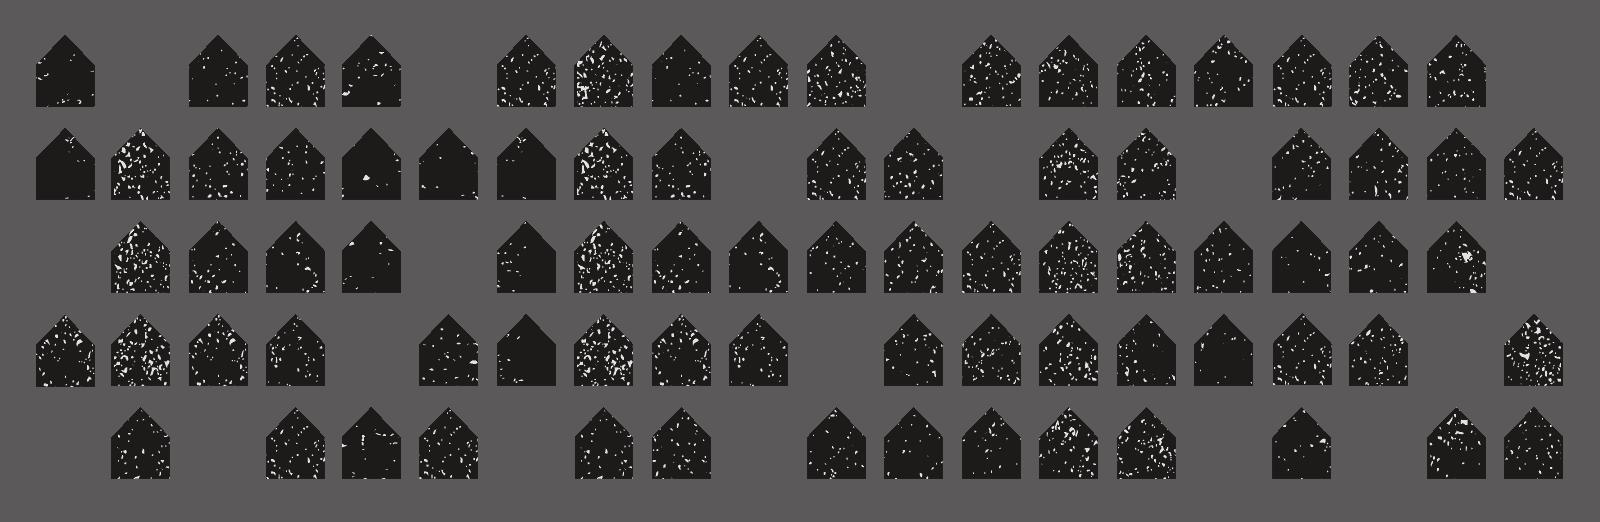 Houses Decreasing animation